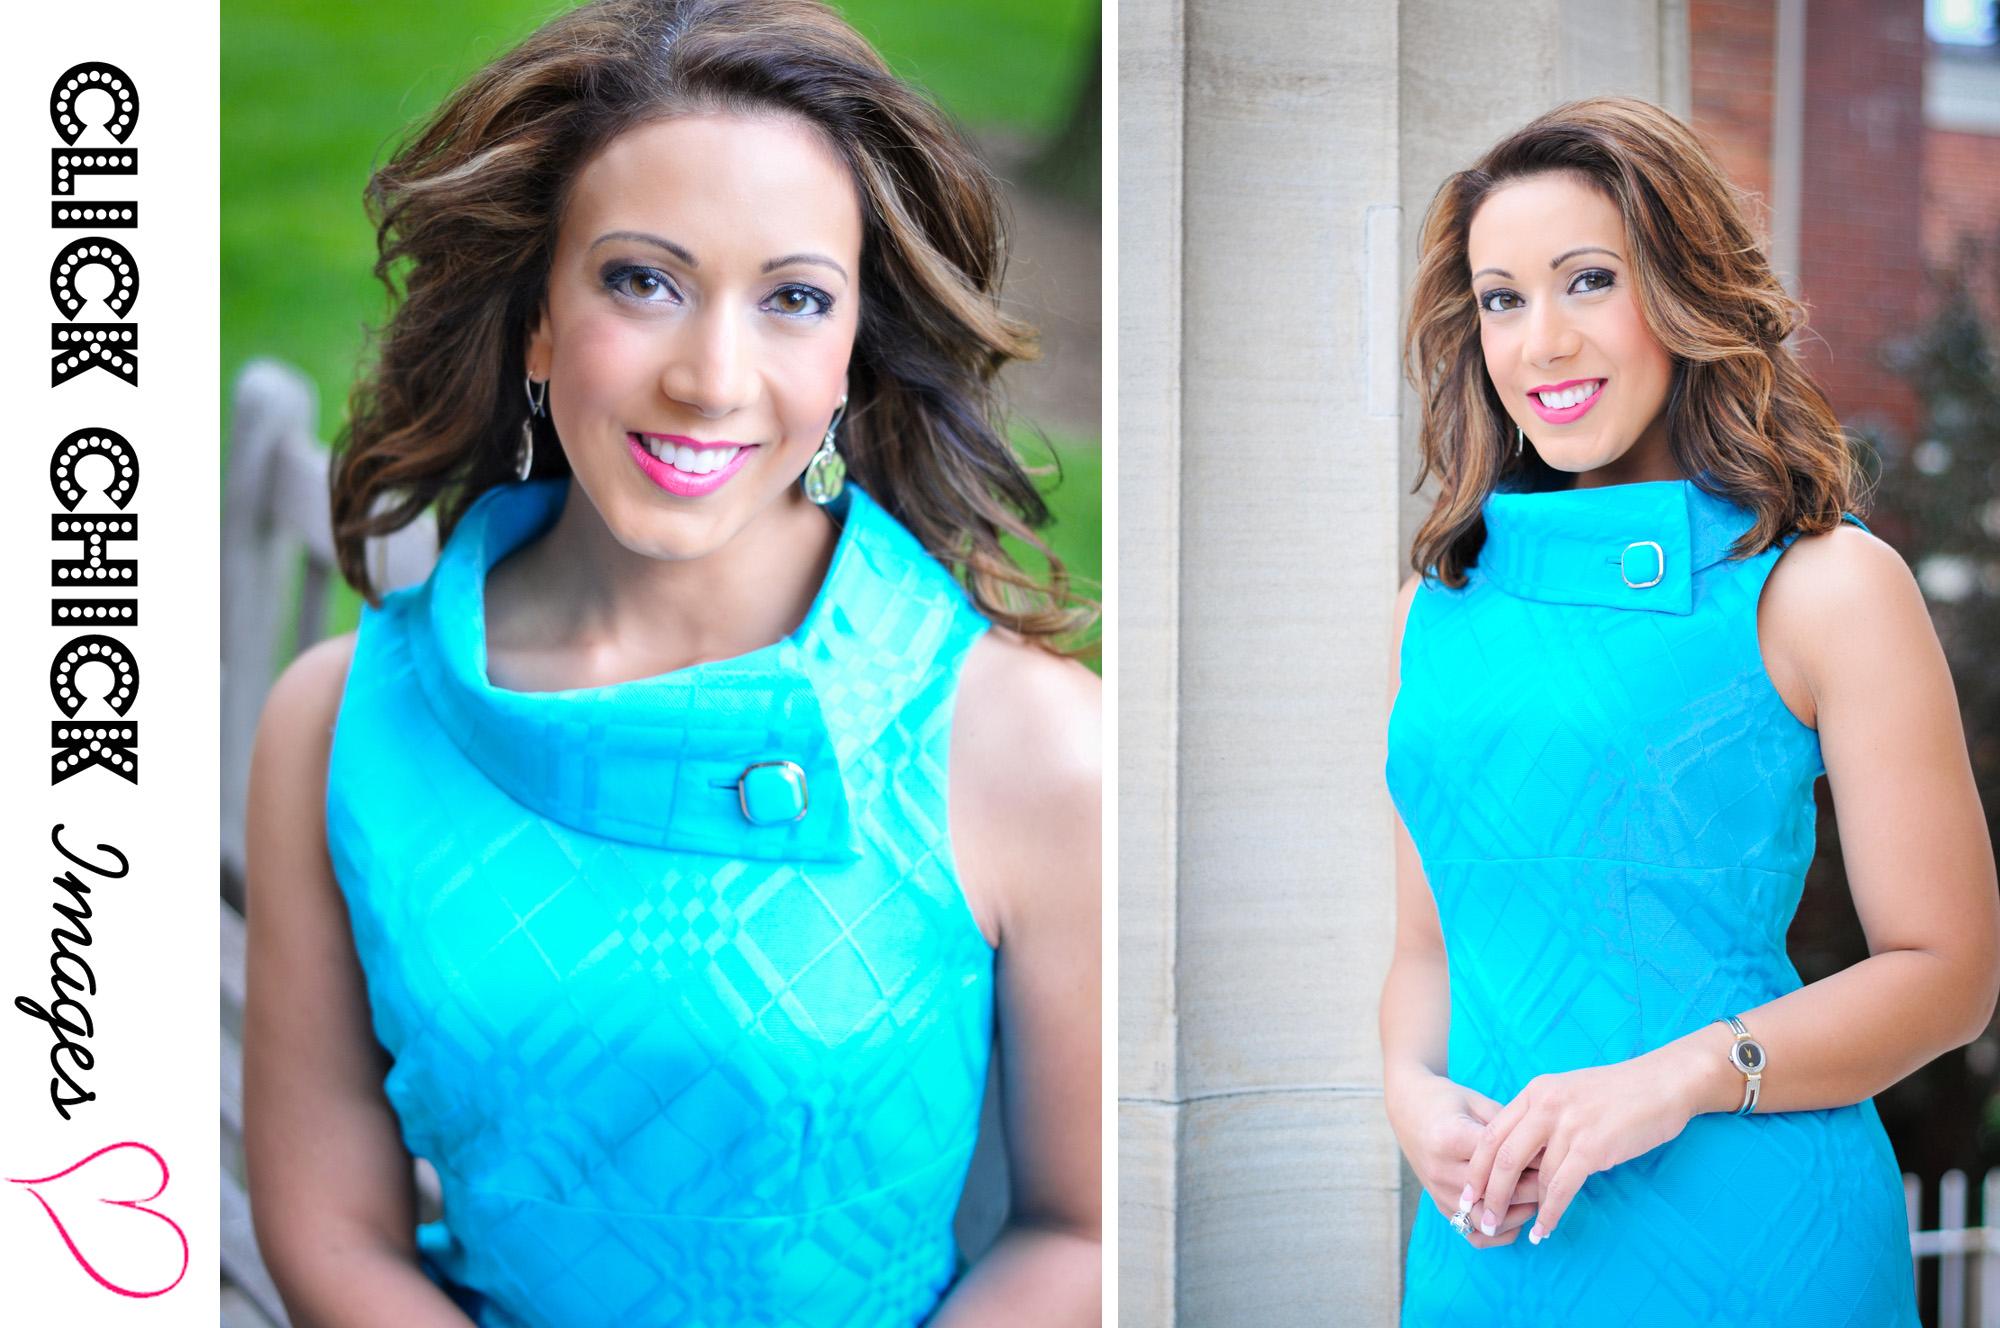 Meet jennifer mobilia ynn buffalo news anchor erie pa for Mobilia wedding